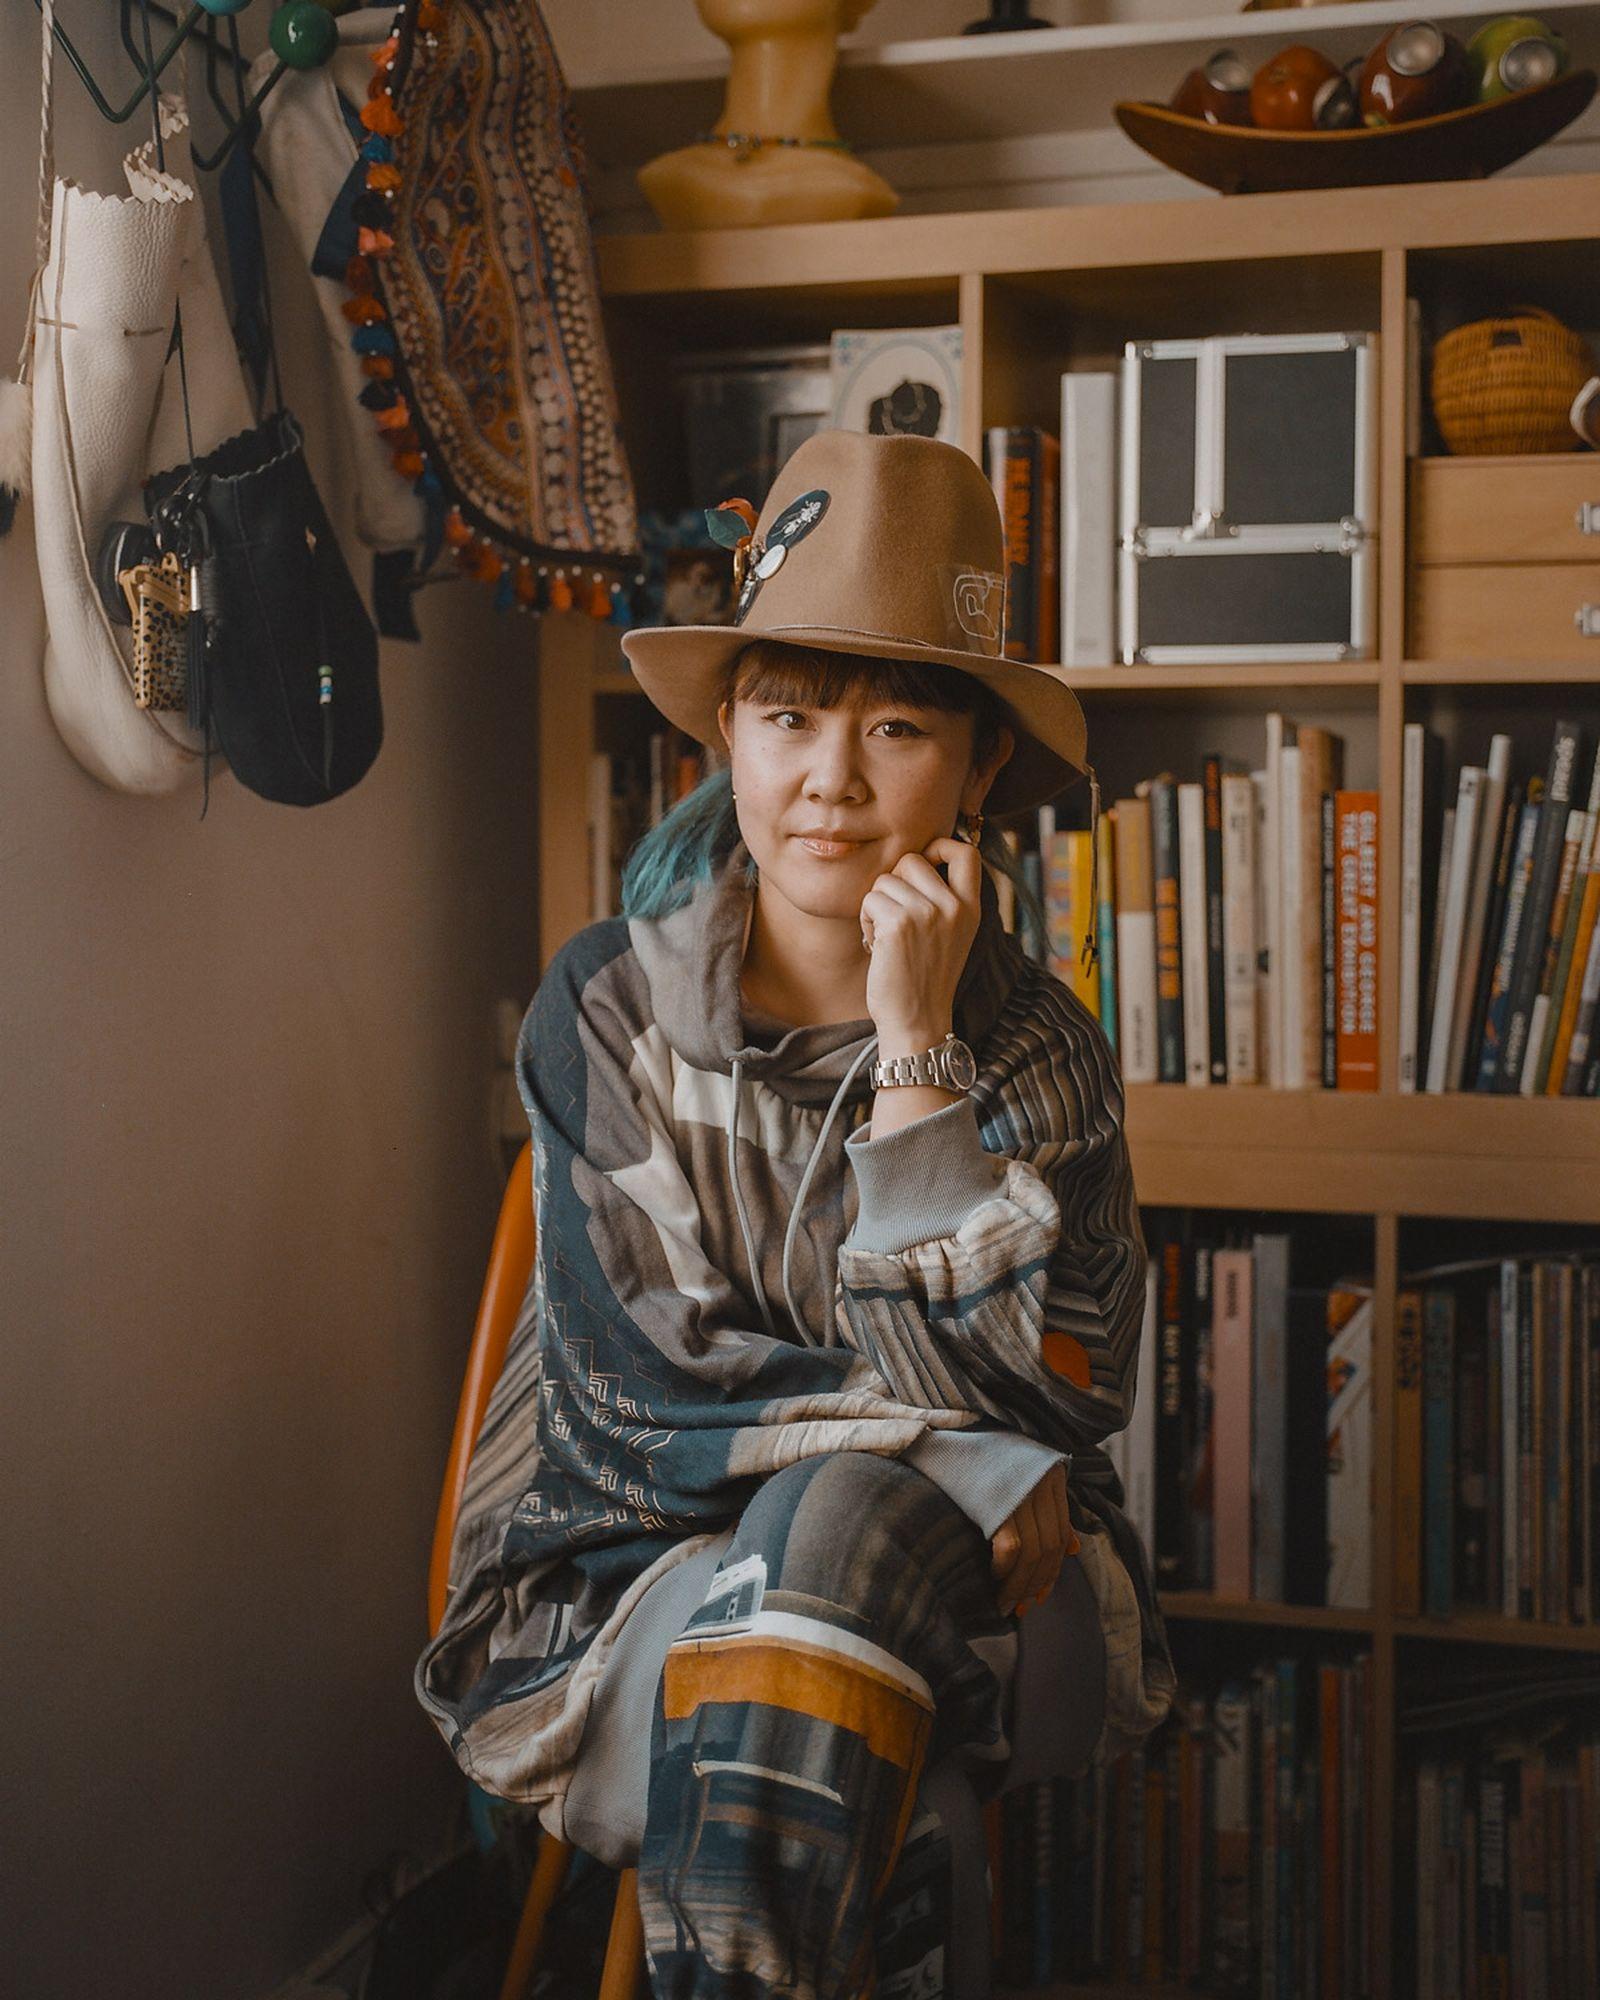 Hitomi Yokoyama wearing a hat sitting indoors in front of a bookshelf